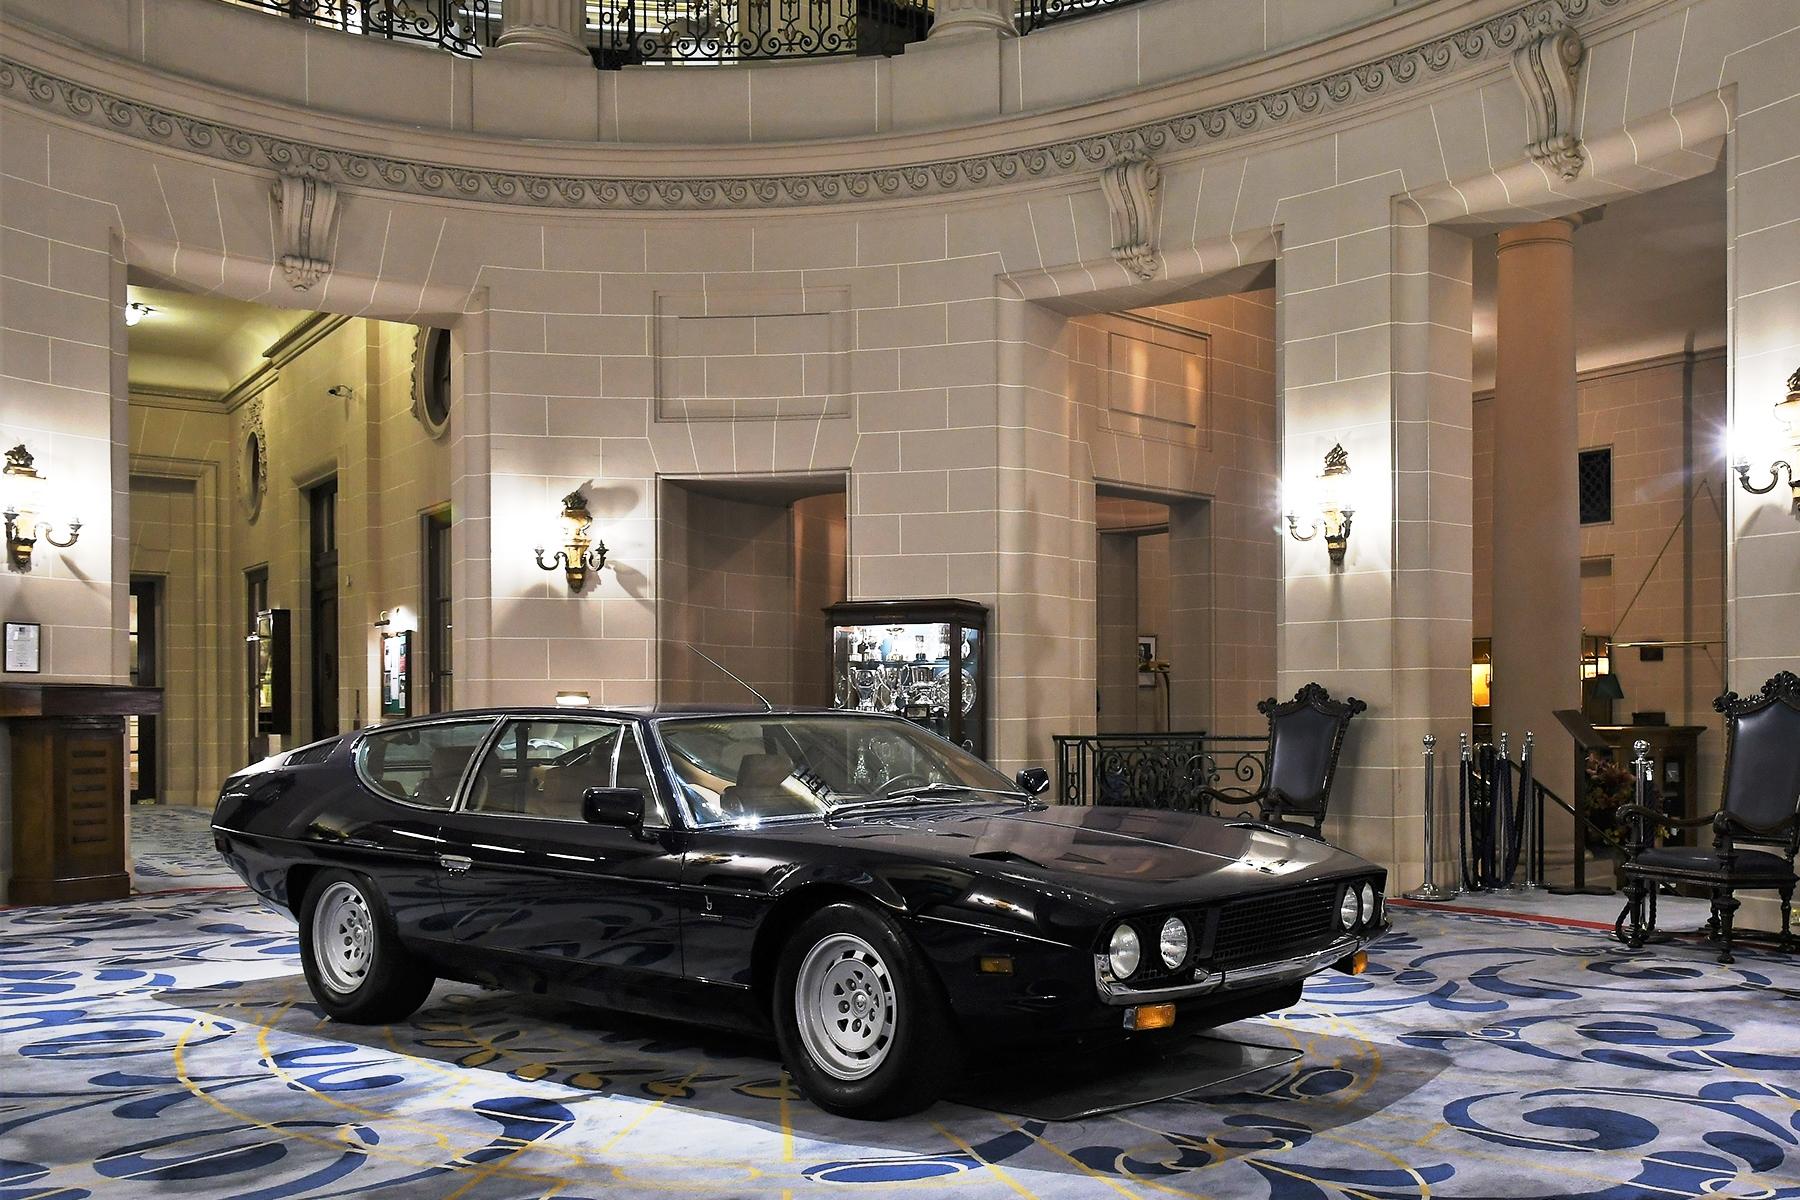 Lamborghini Marks Fiftieth Anniversary of the Espada